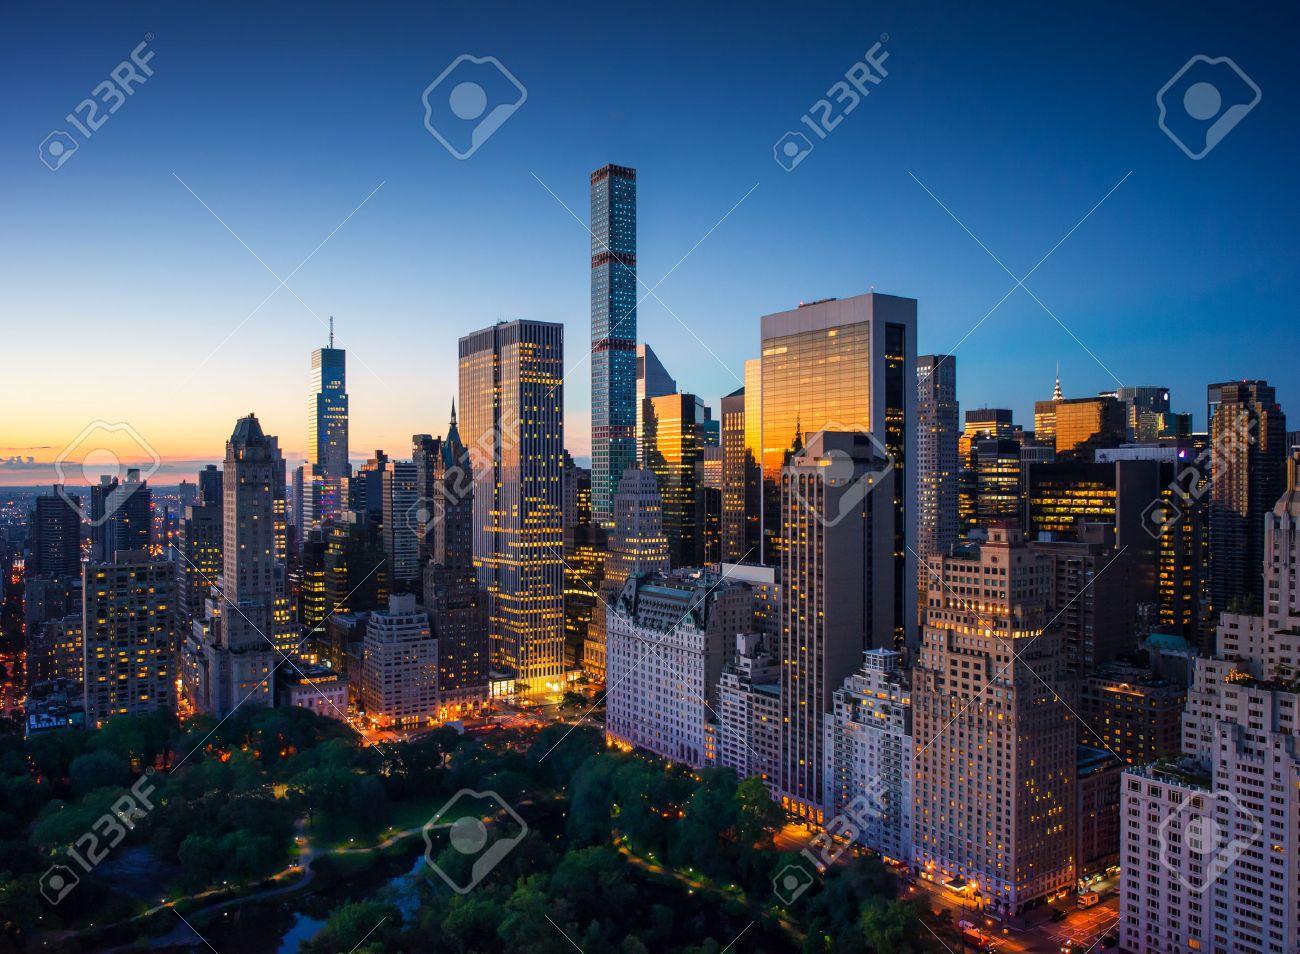 New York city - amazing sunrise over central park and upper east side manhattan - Birds Eye - 32773897